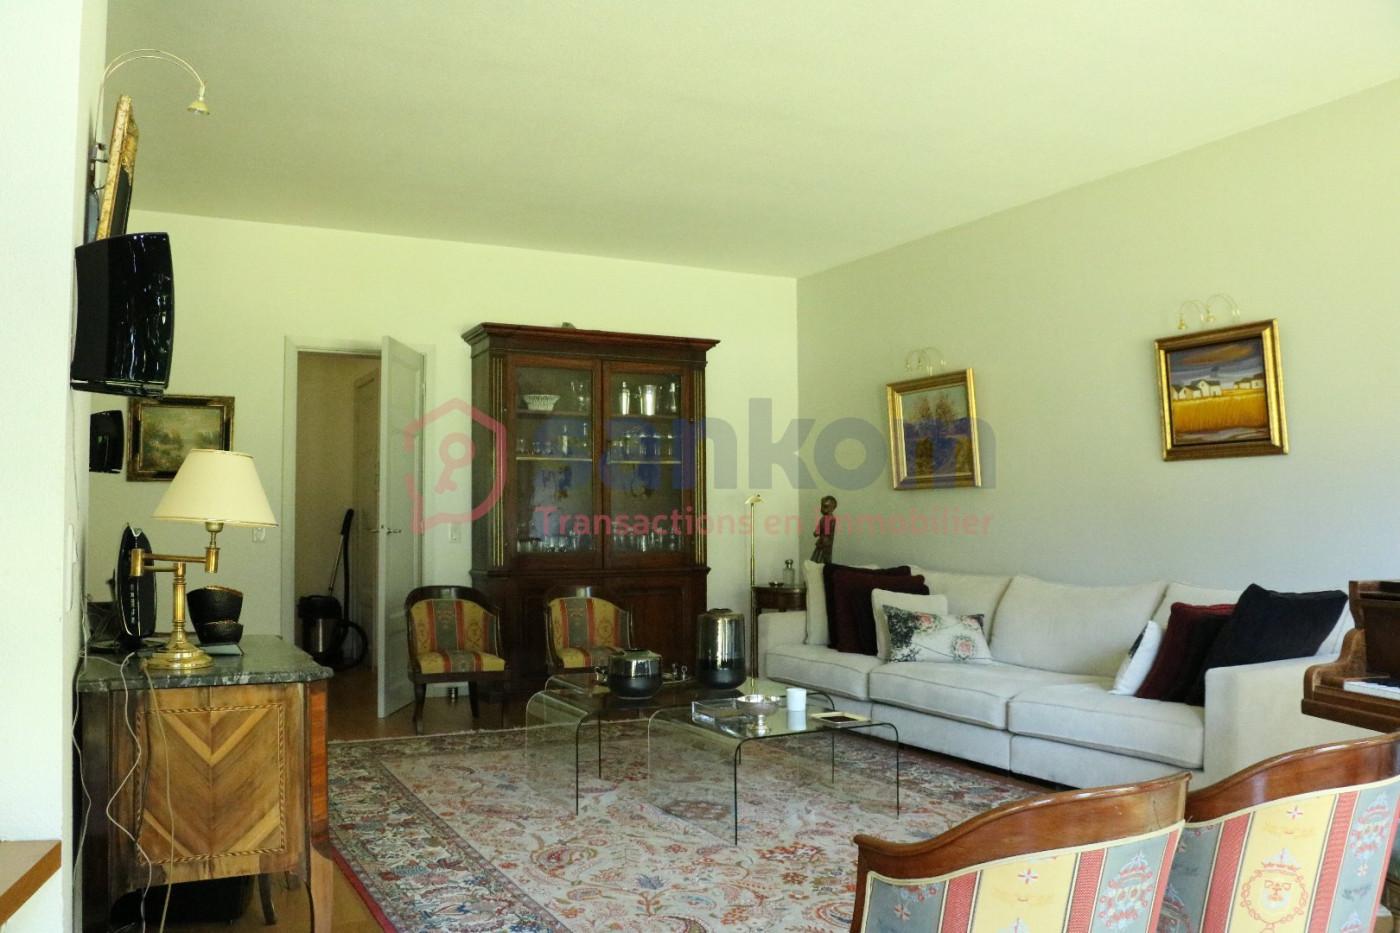 A vendre  Le Puy En Velay | Réf 43002255 - Belledent nadine